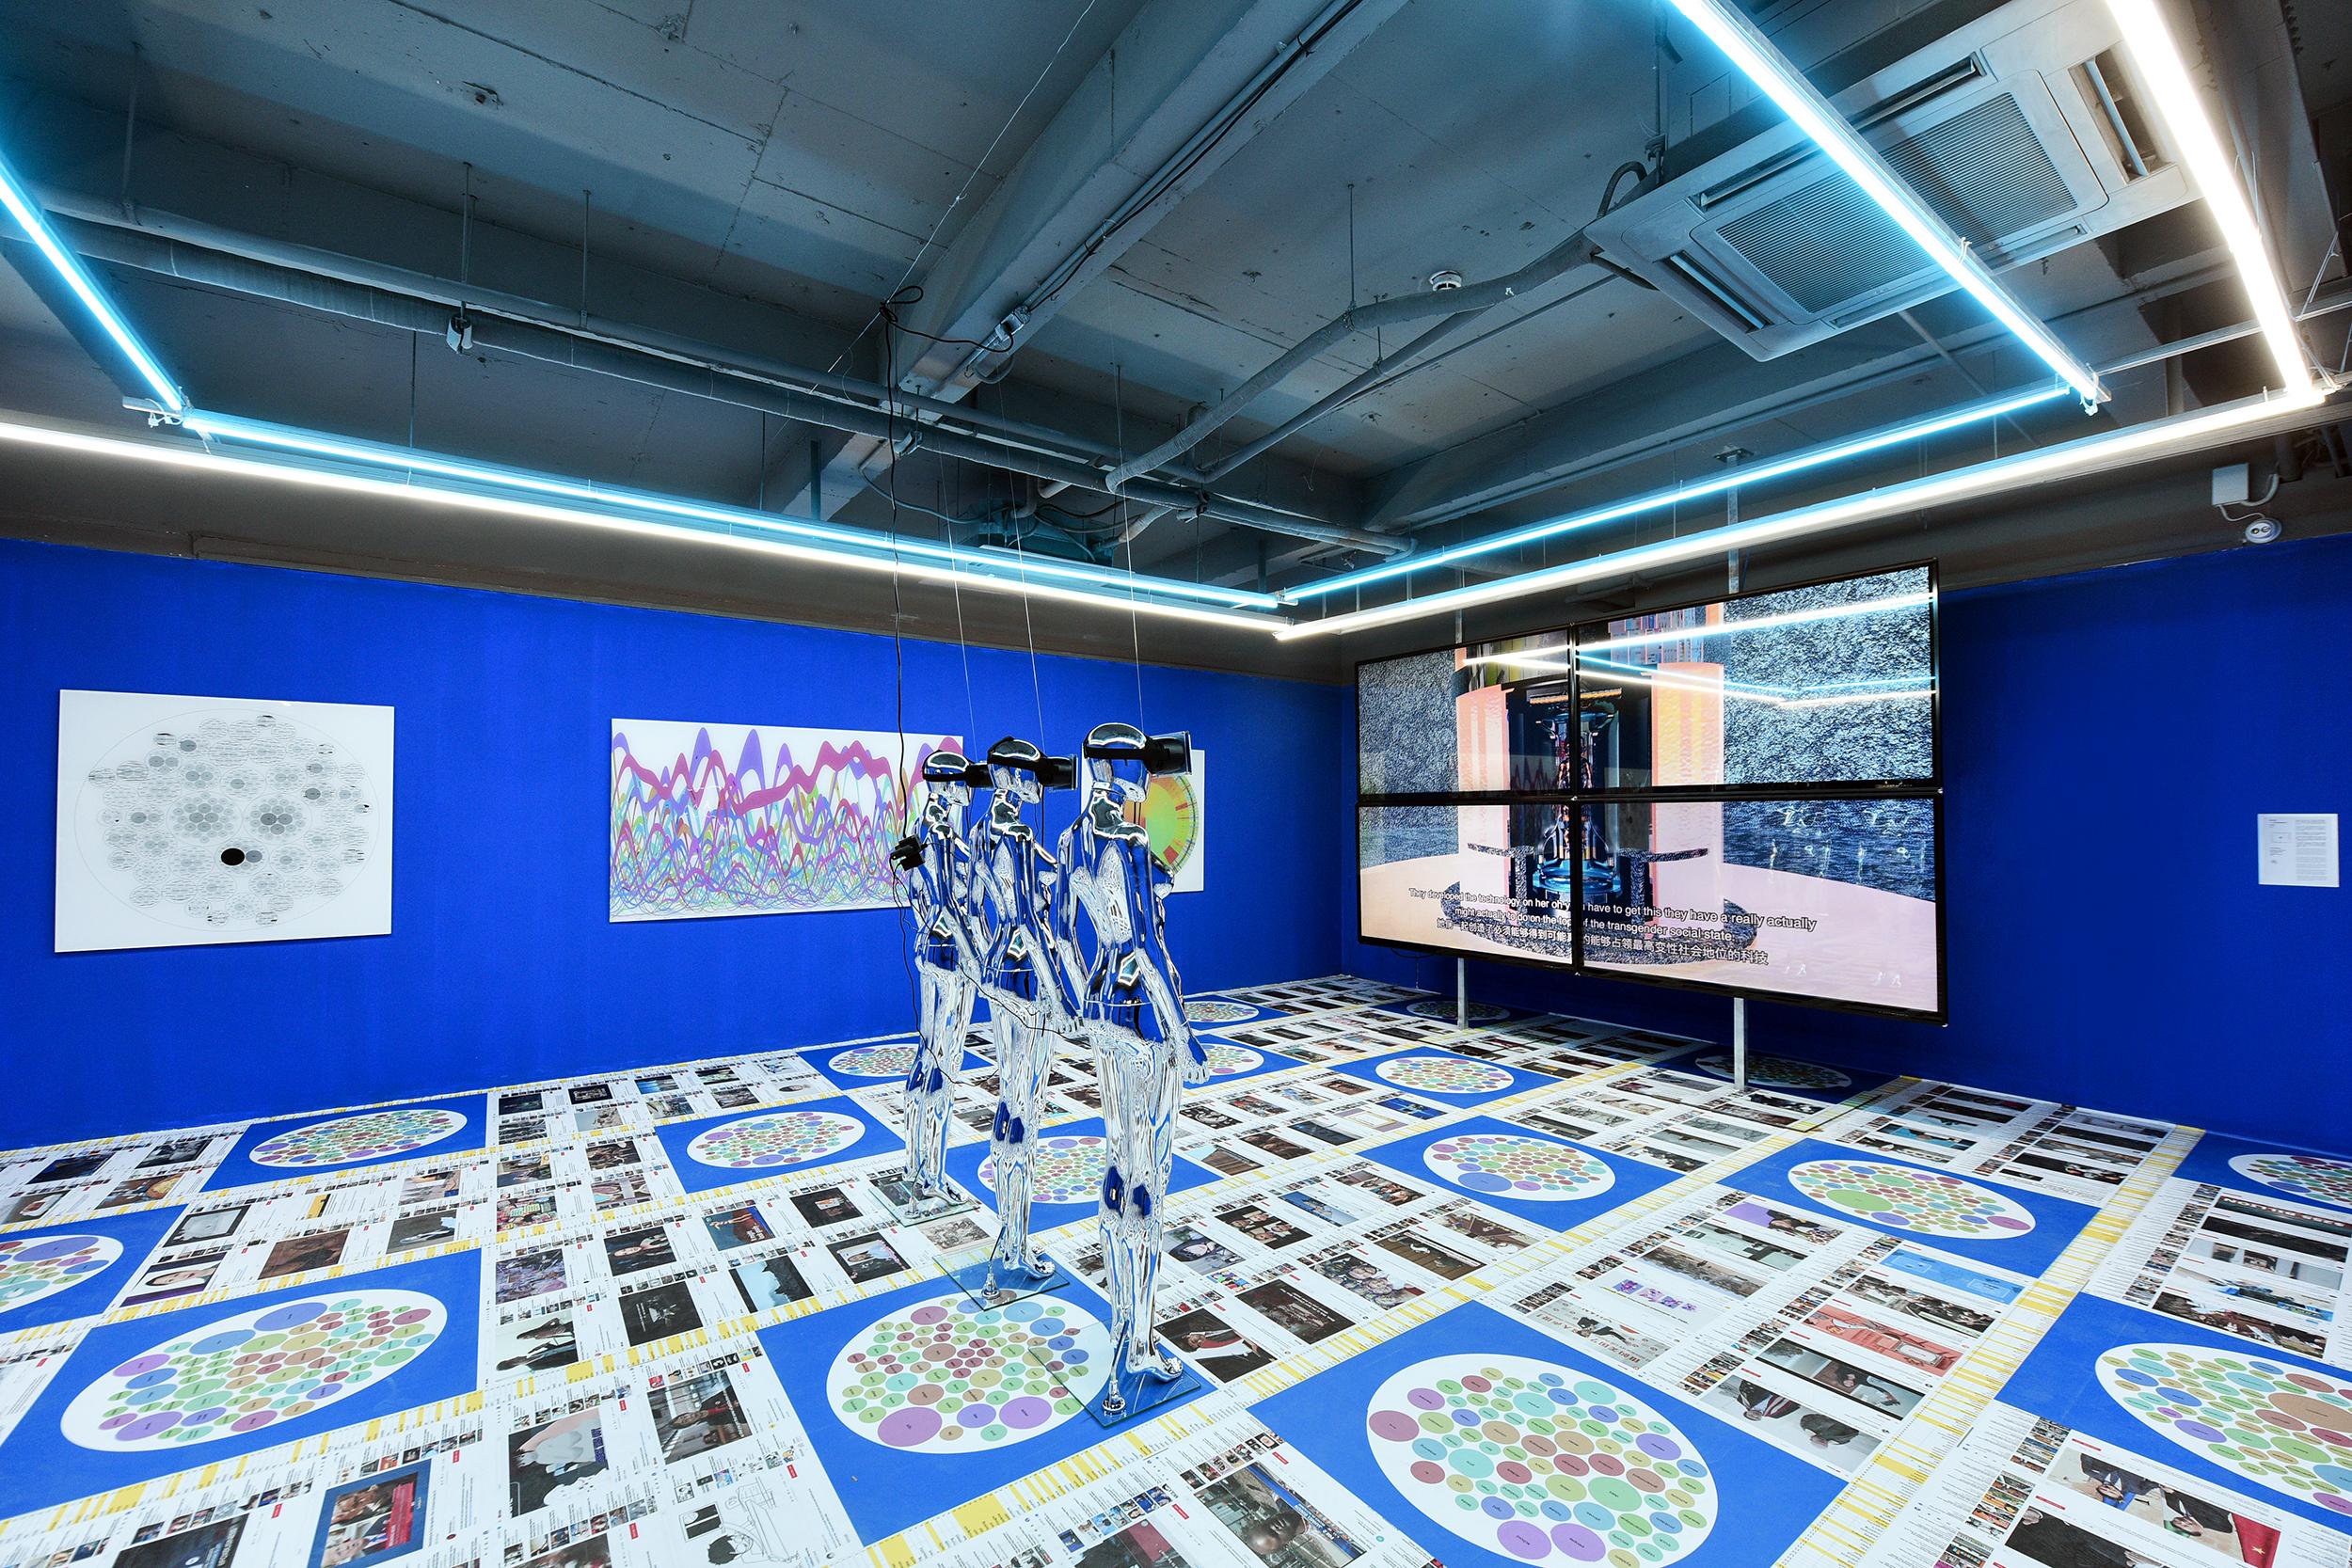 Conversations | Jiaoyang Li and Ziyang Wu  On Video Game Art